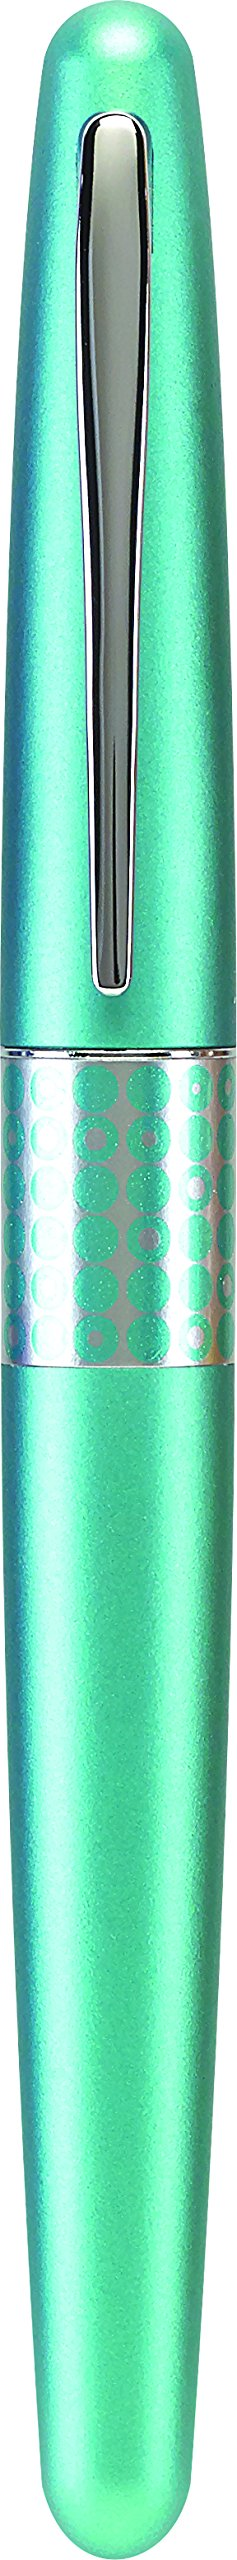 Pilot MR Retro Pop Collection Fountain Pen, Turquoise Barrel with Dots Accent, Fine Nib, Black Ink (91436) by Pilot (Image #3)